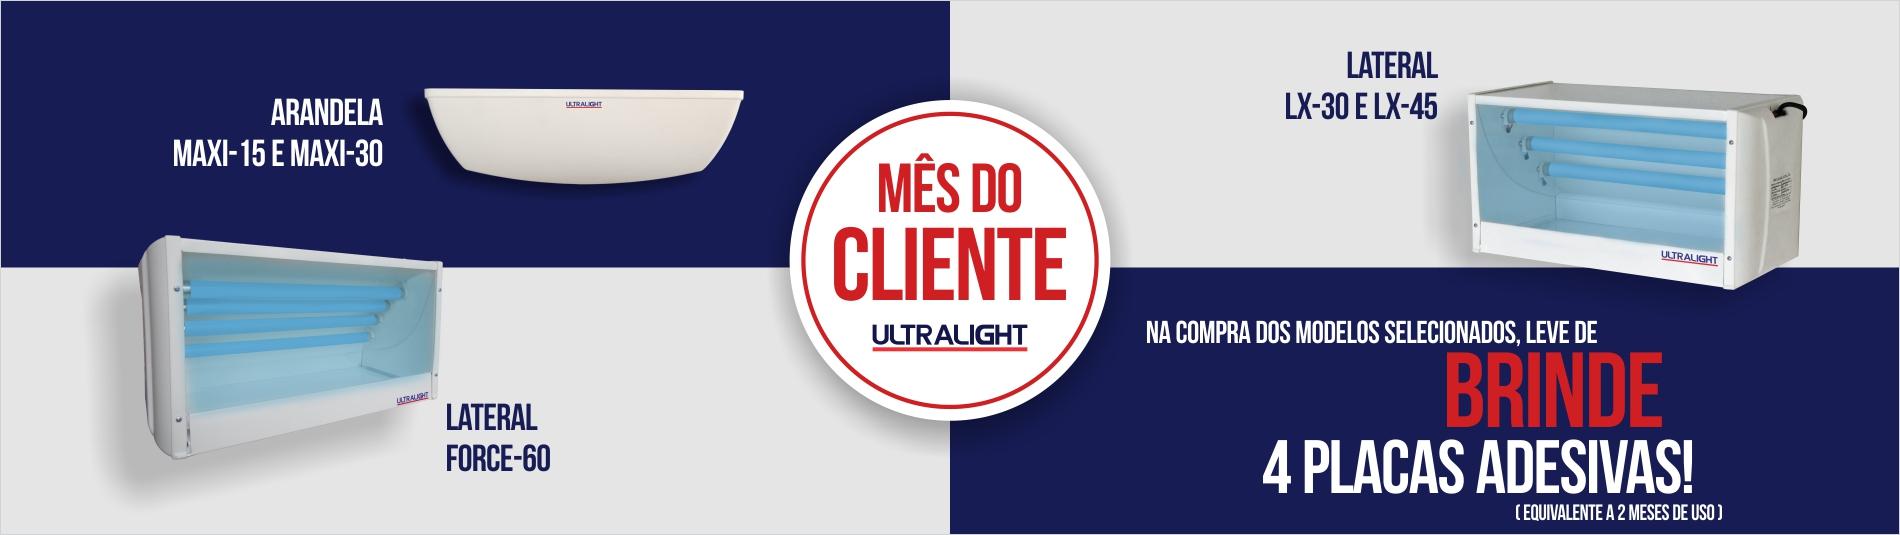 Mês do cliente Ultralight